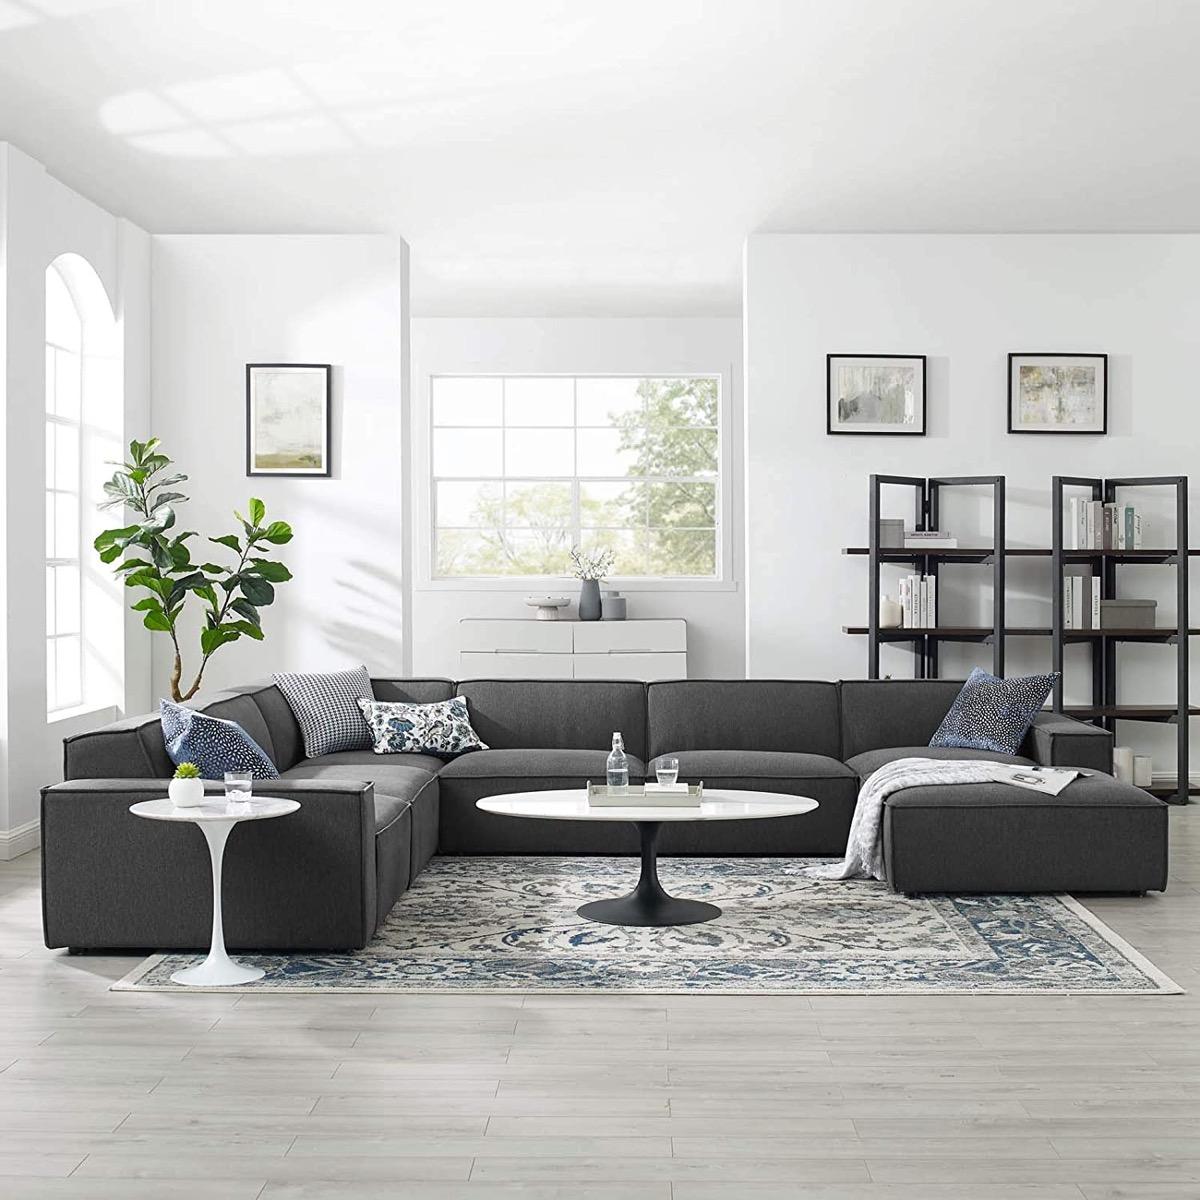 Modern-Large-Gray-Modular-Sofa